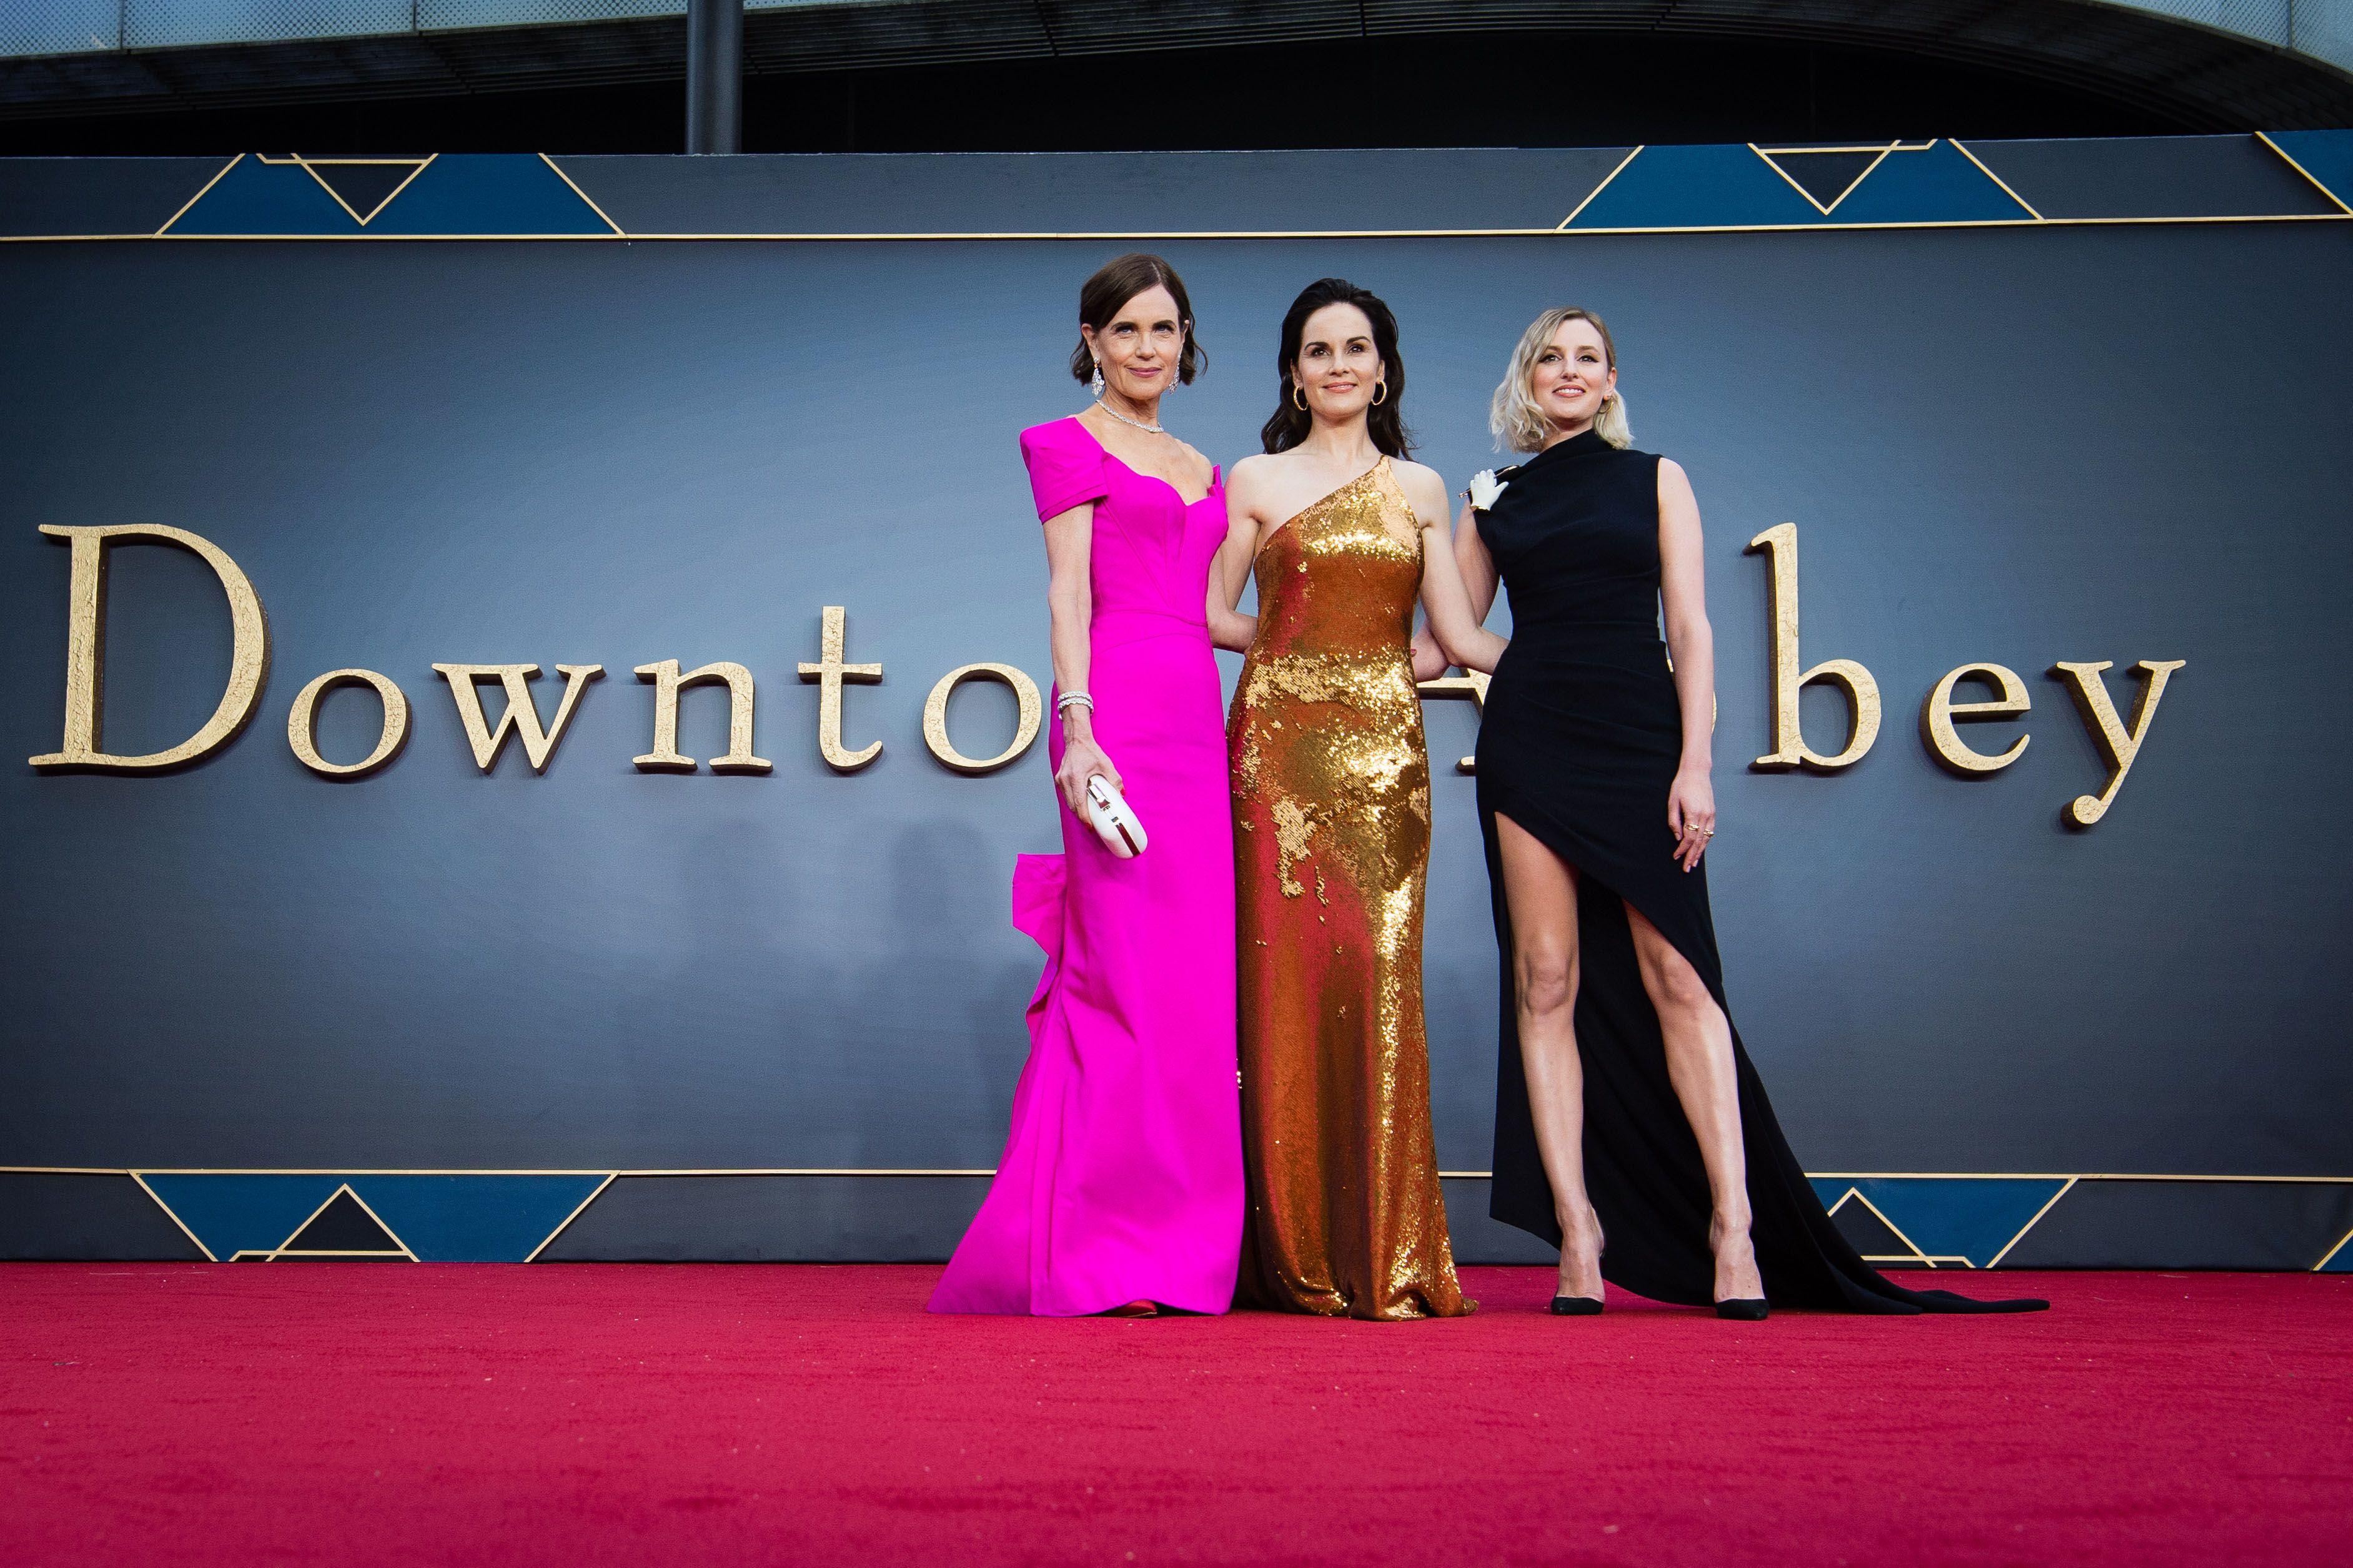 Inside the Downton Abbey film premiere